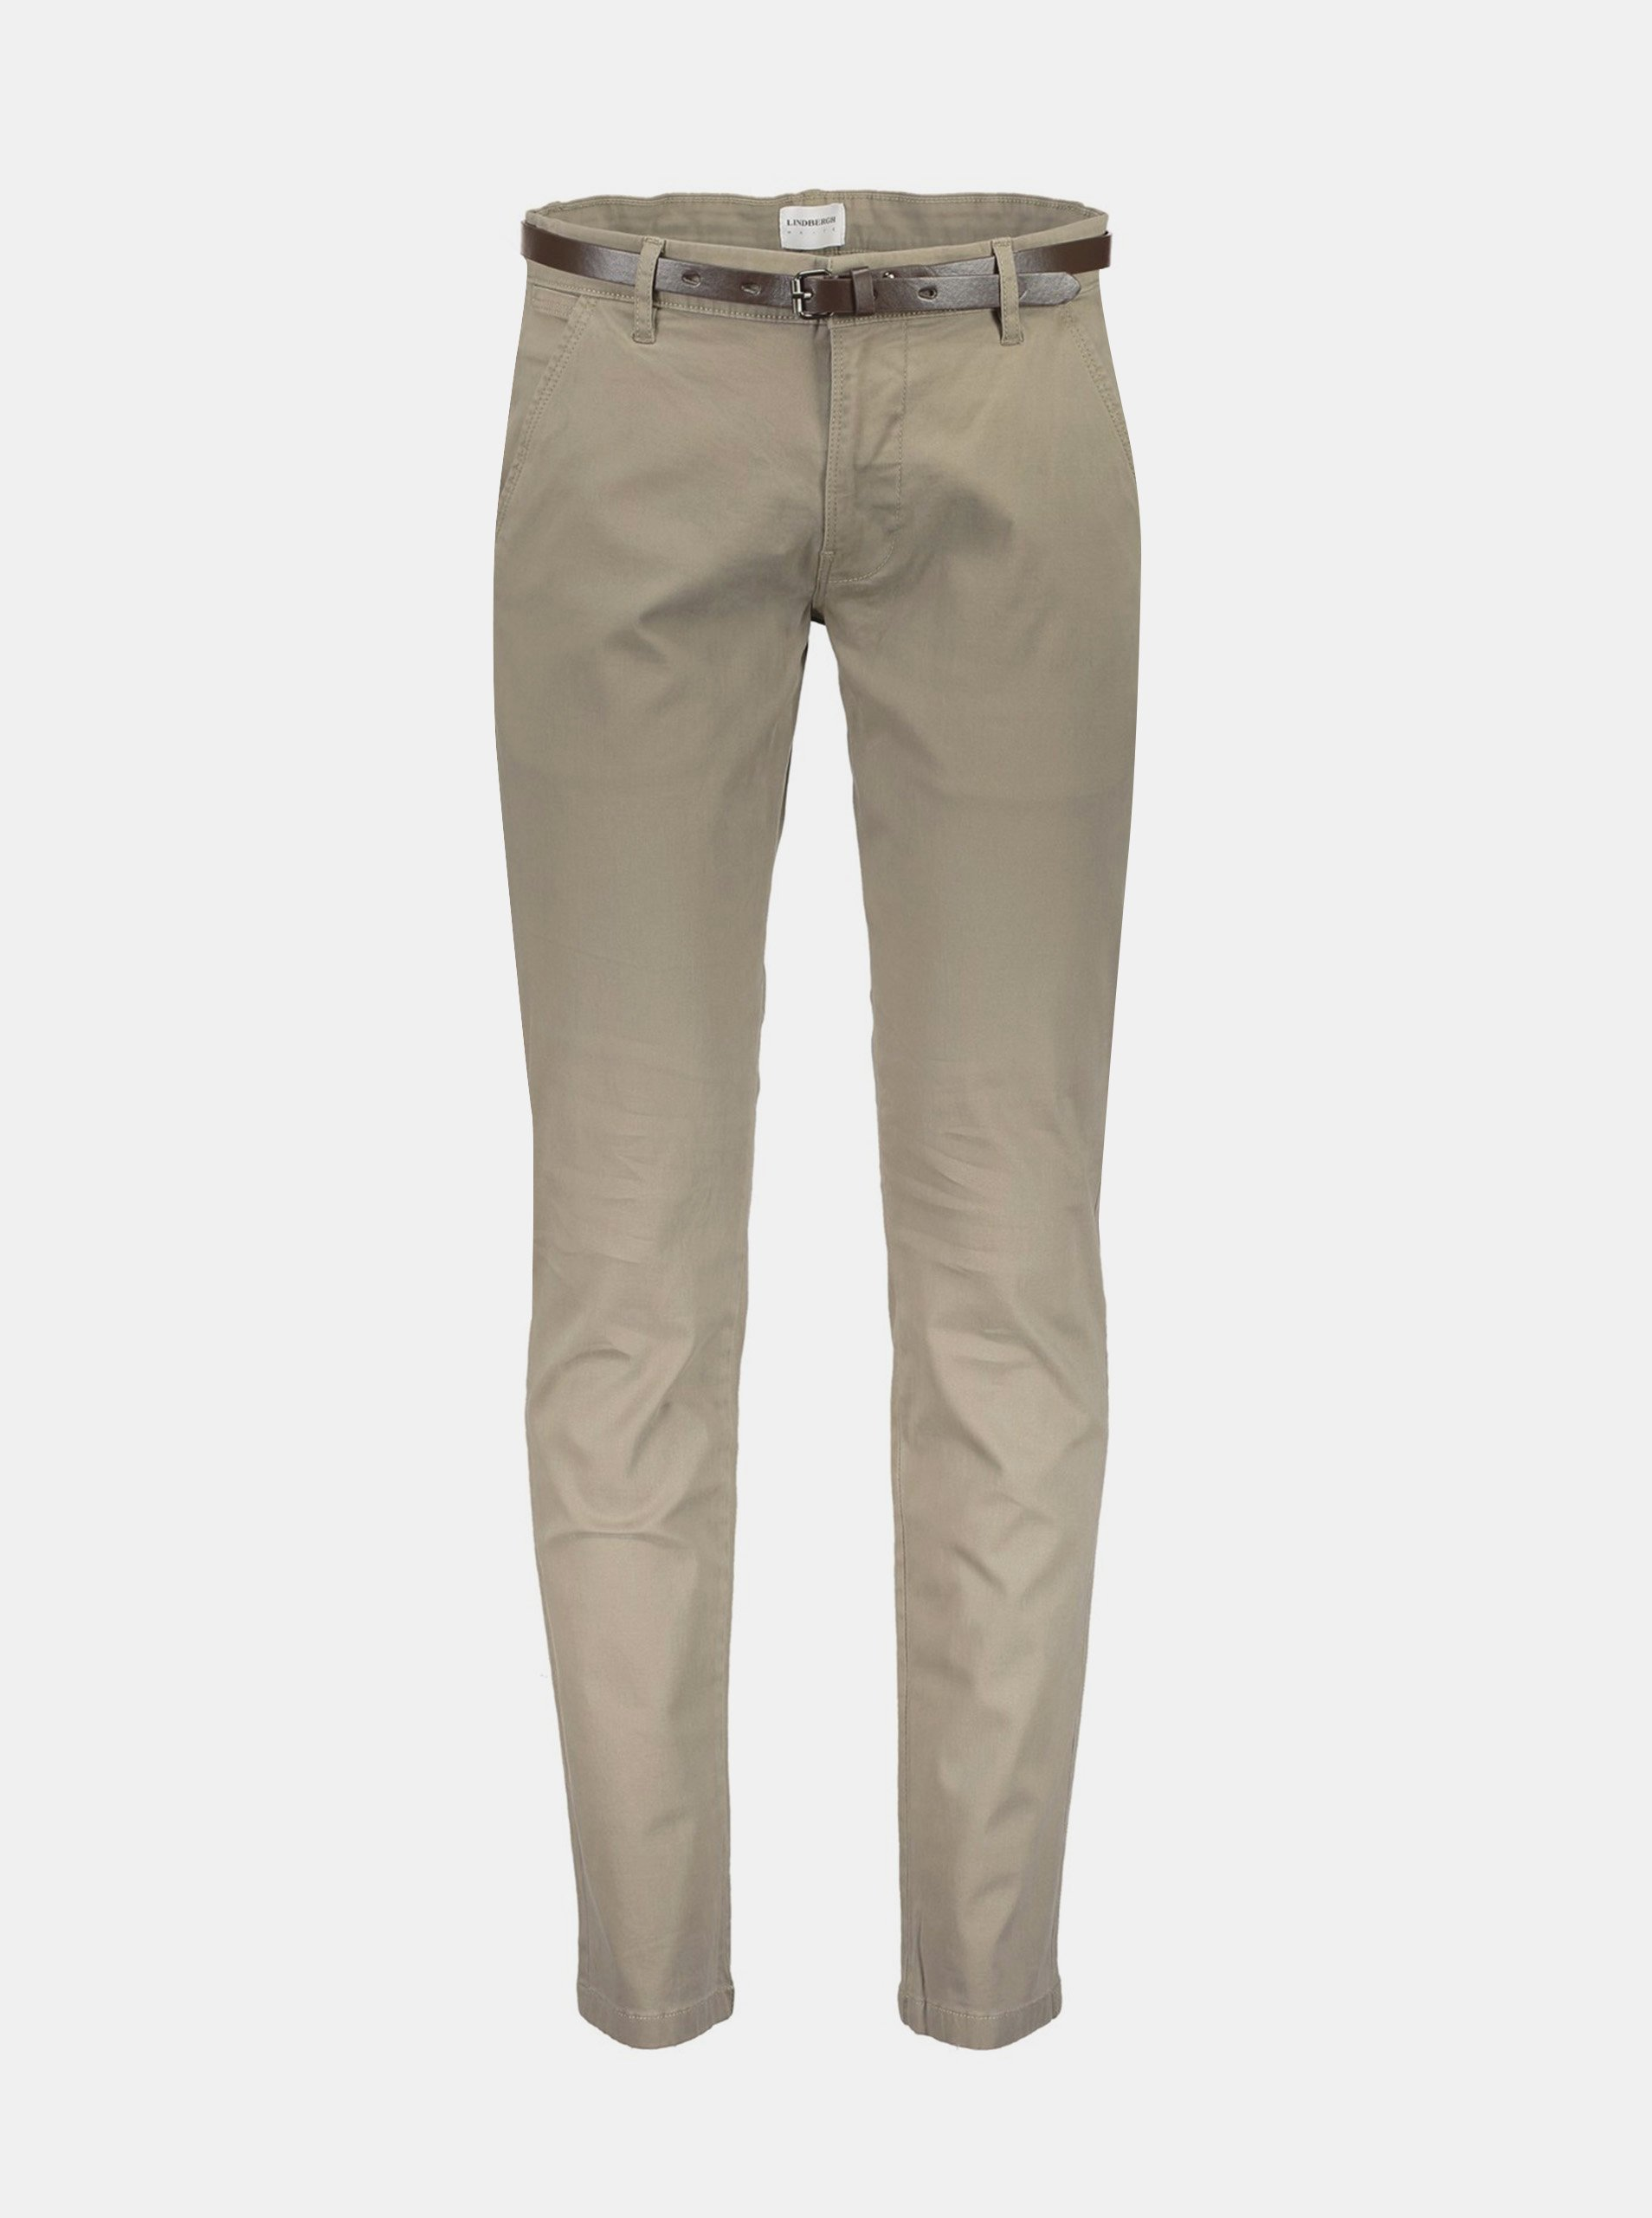 Béžové chino nohavice Lindbergh.